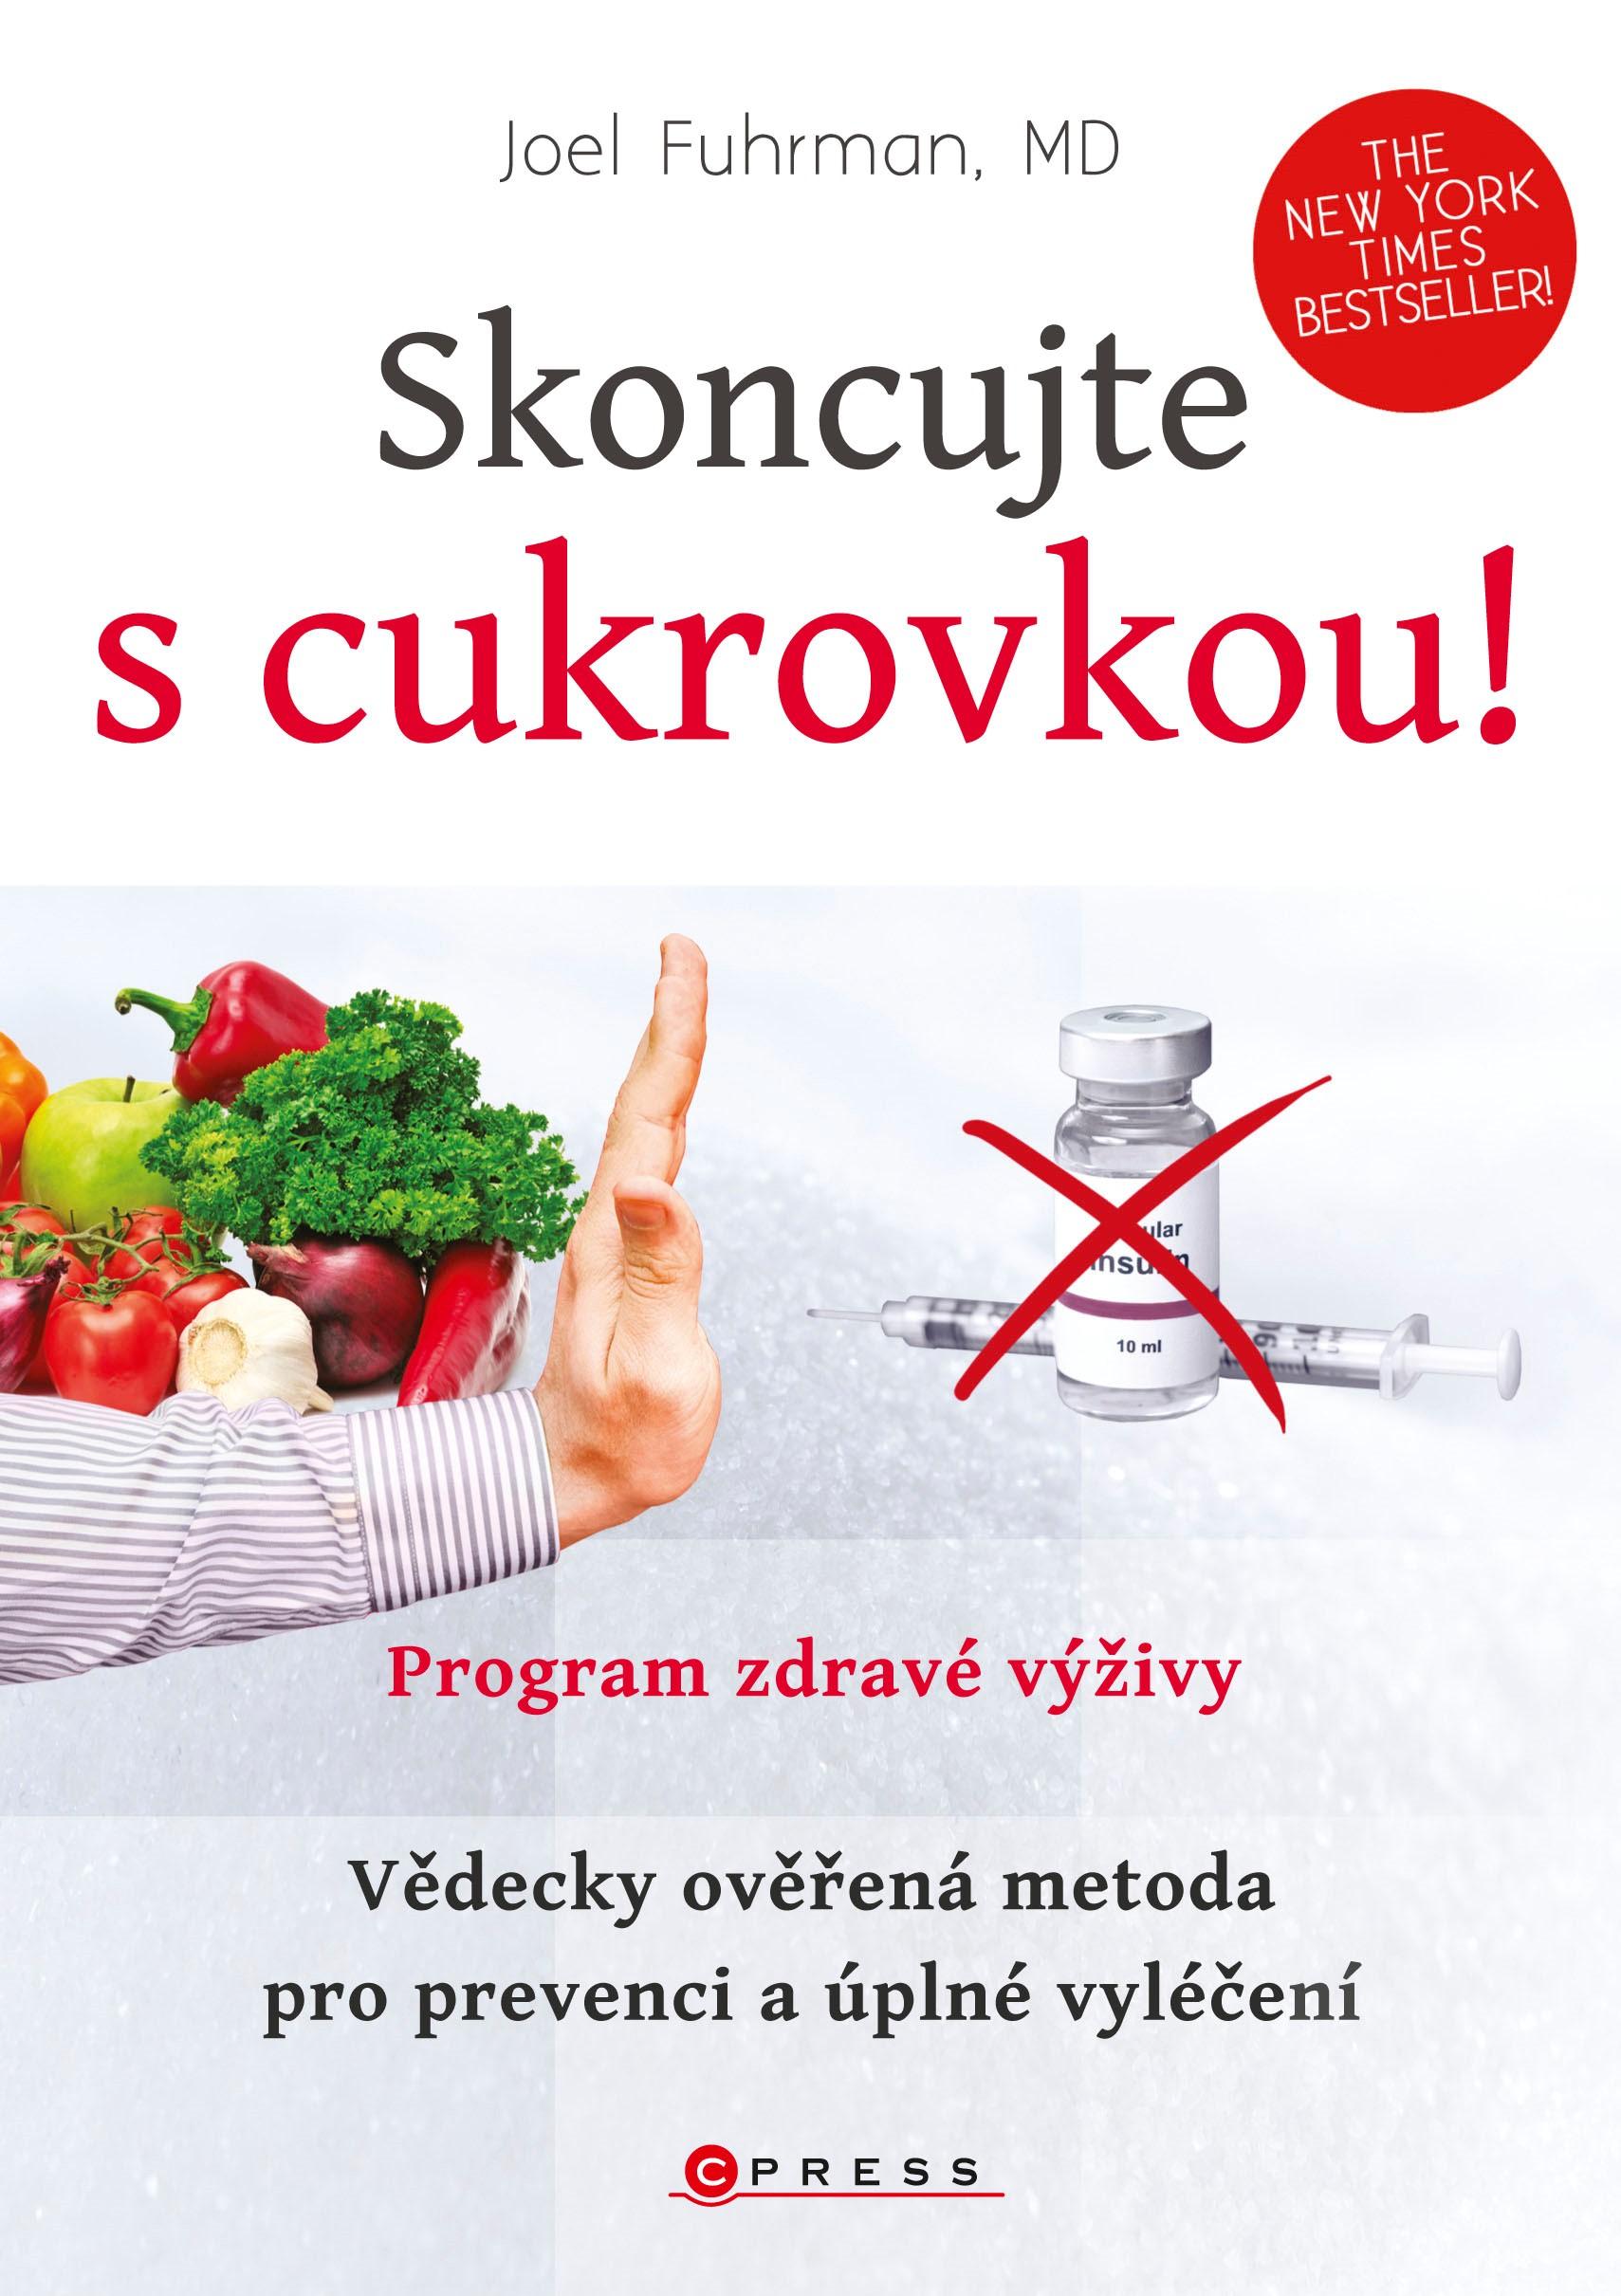 Skoncujte s cukrovkou!